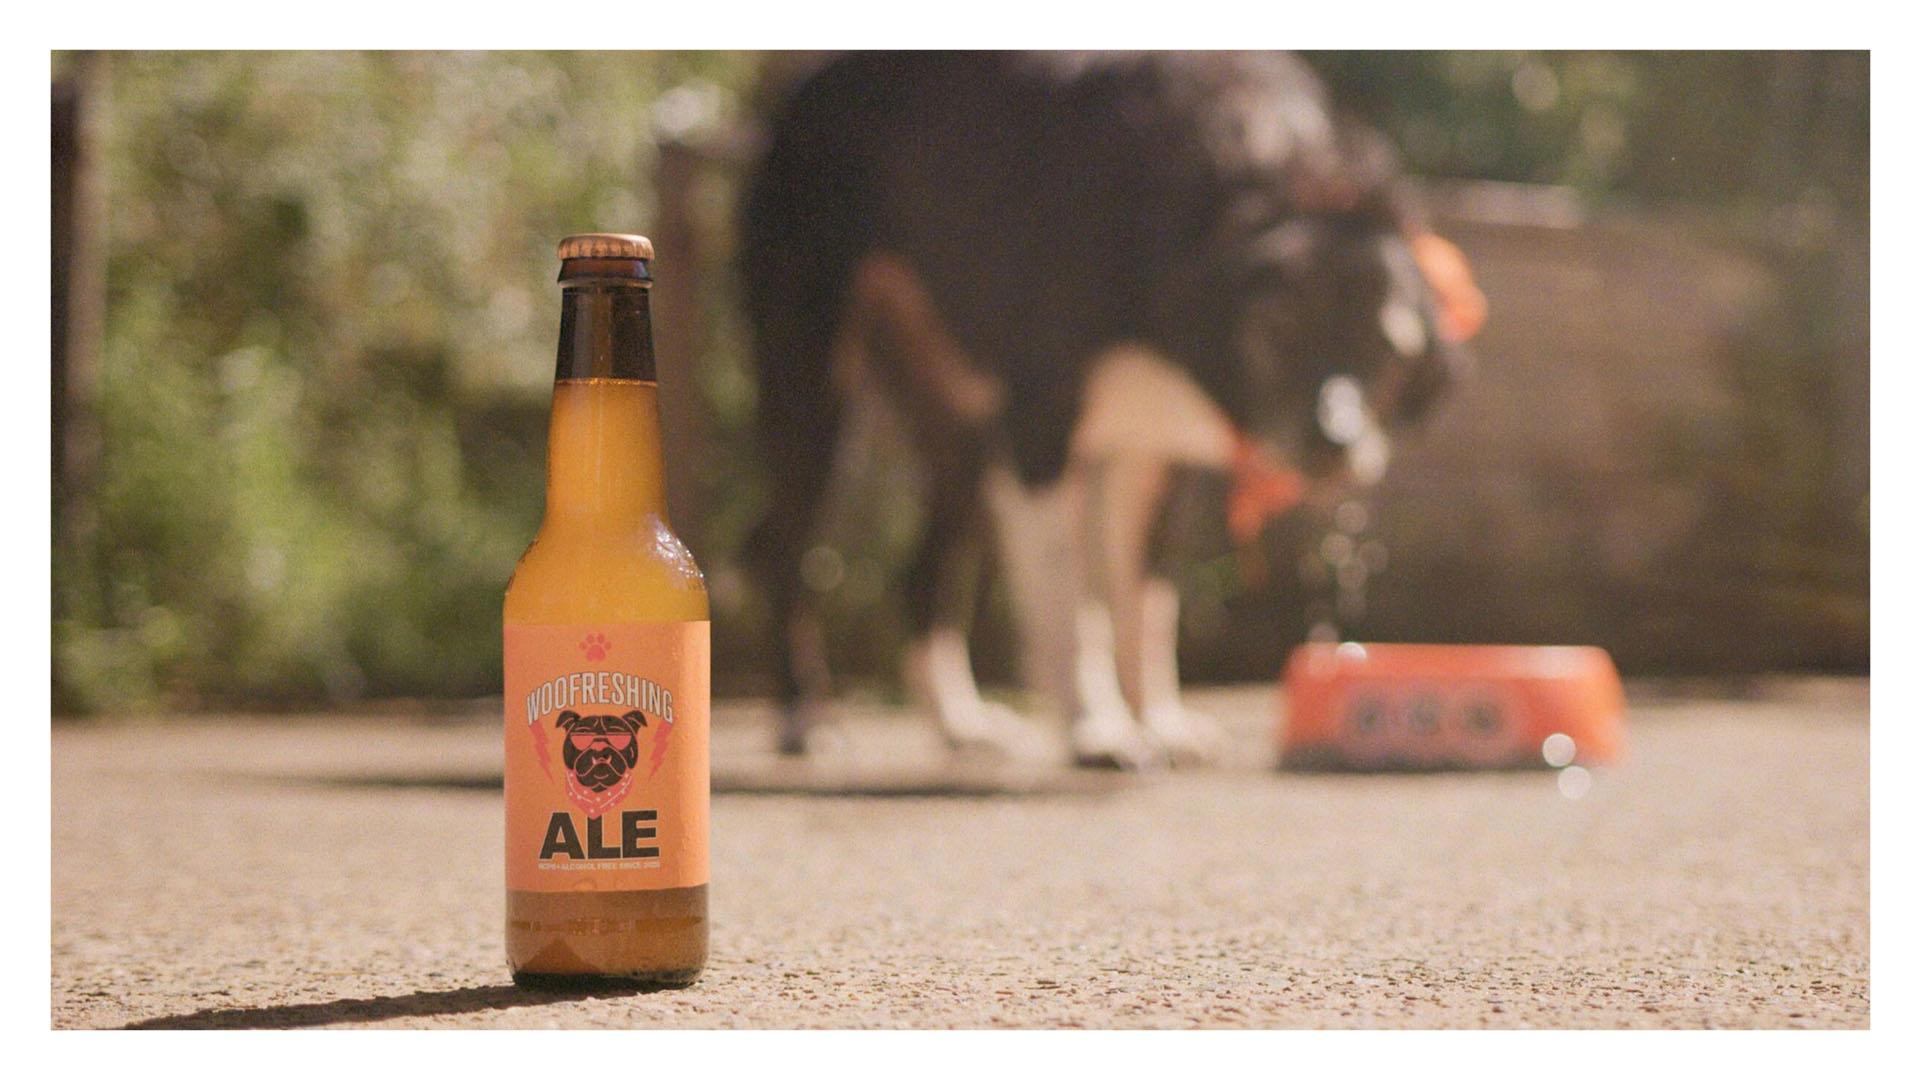 BWS - Woofreshing Ale